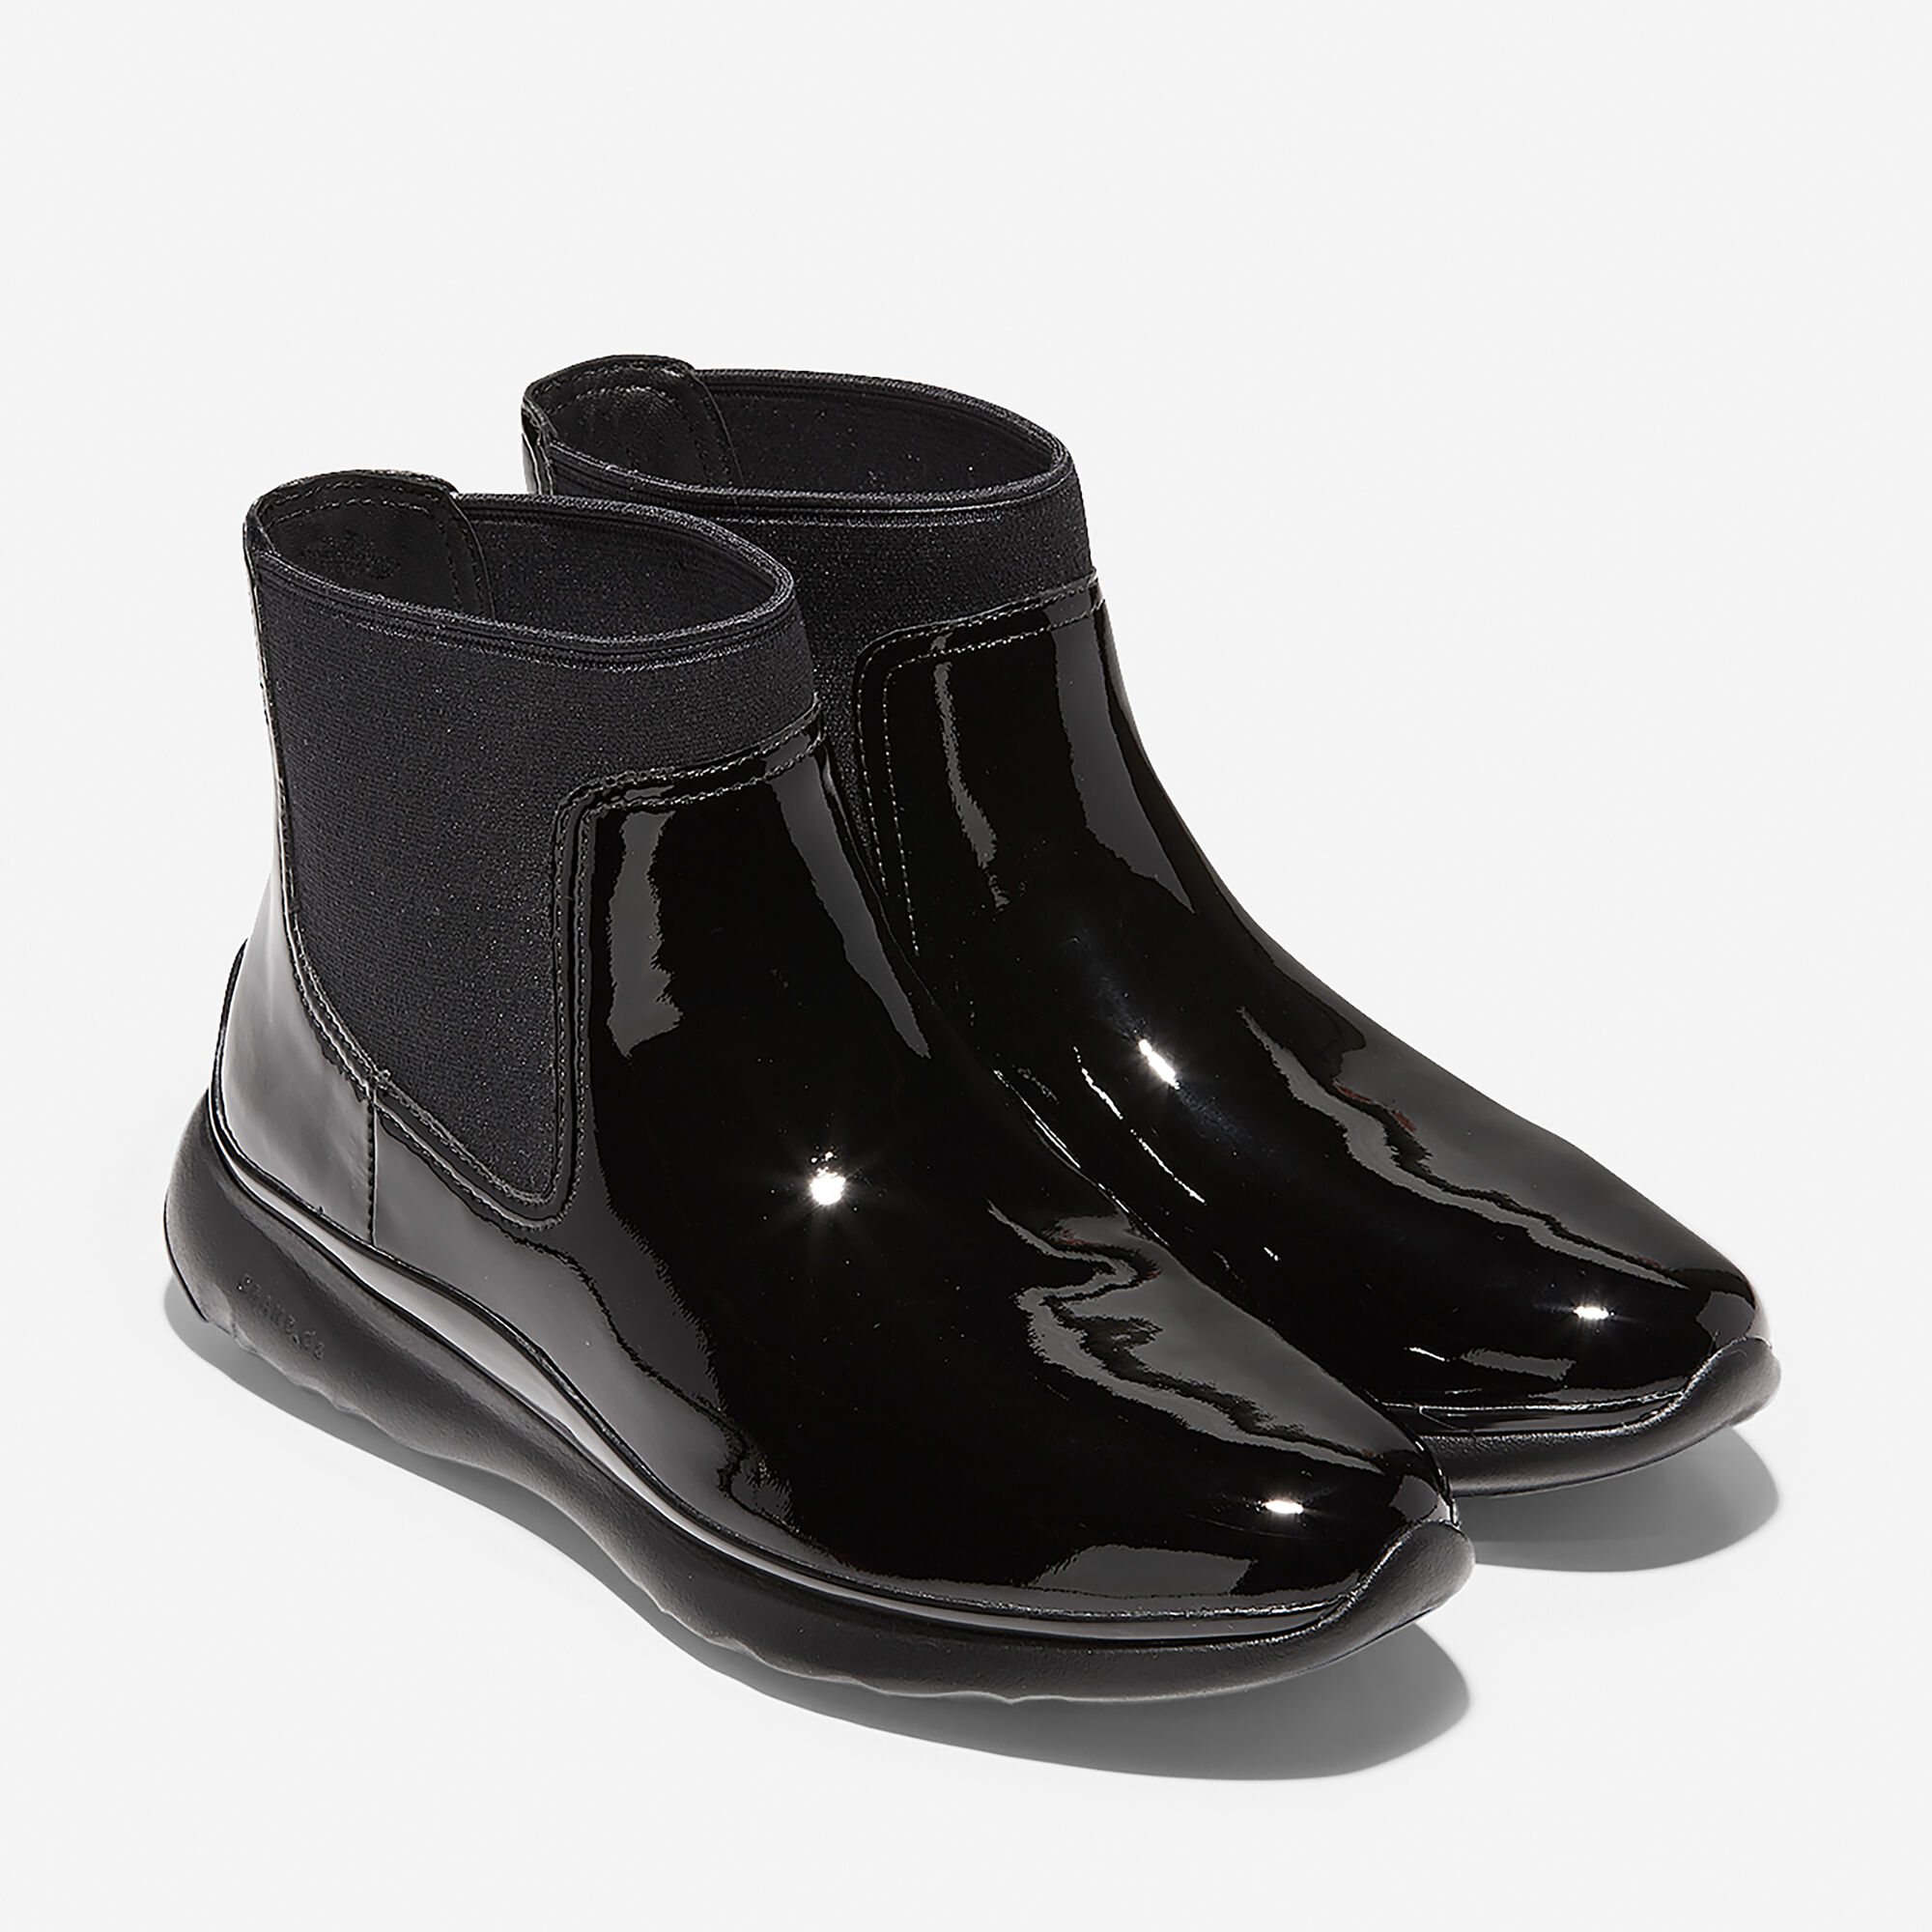 596b545c309 ZERØGRAND Waterproof Chelsea Boot · Women s 3.ZERØGRAND Waterproof Chelsea  Boot ...